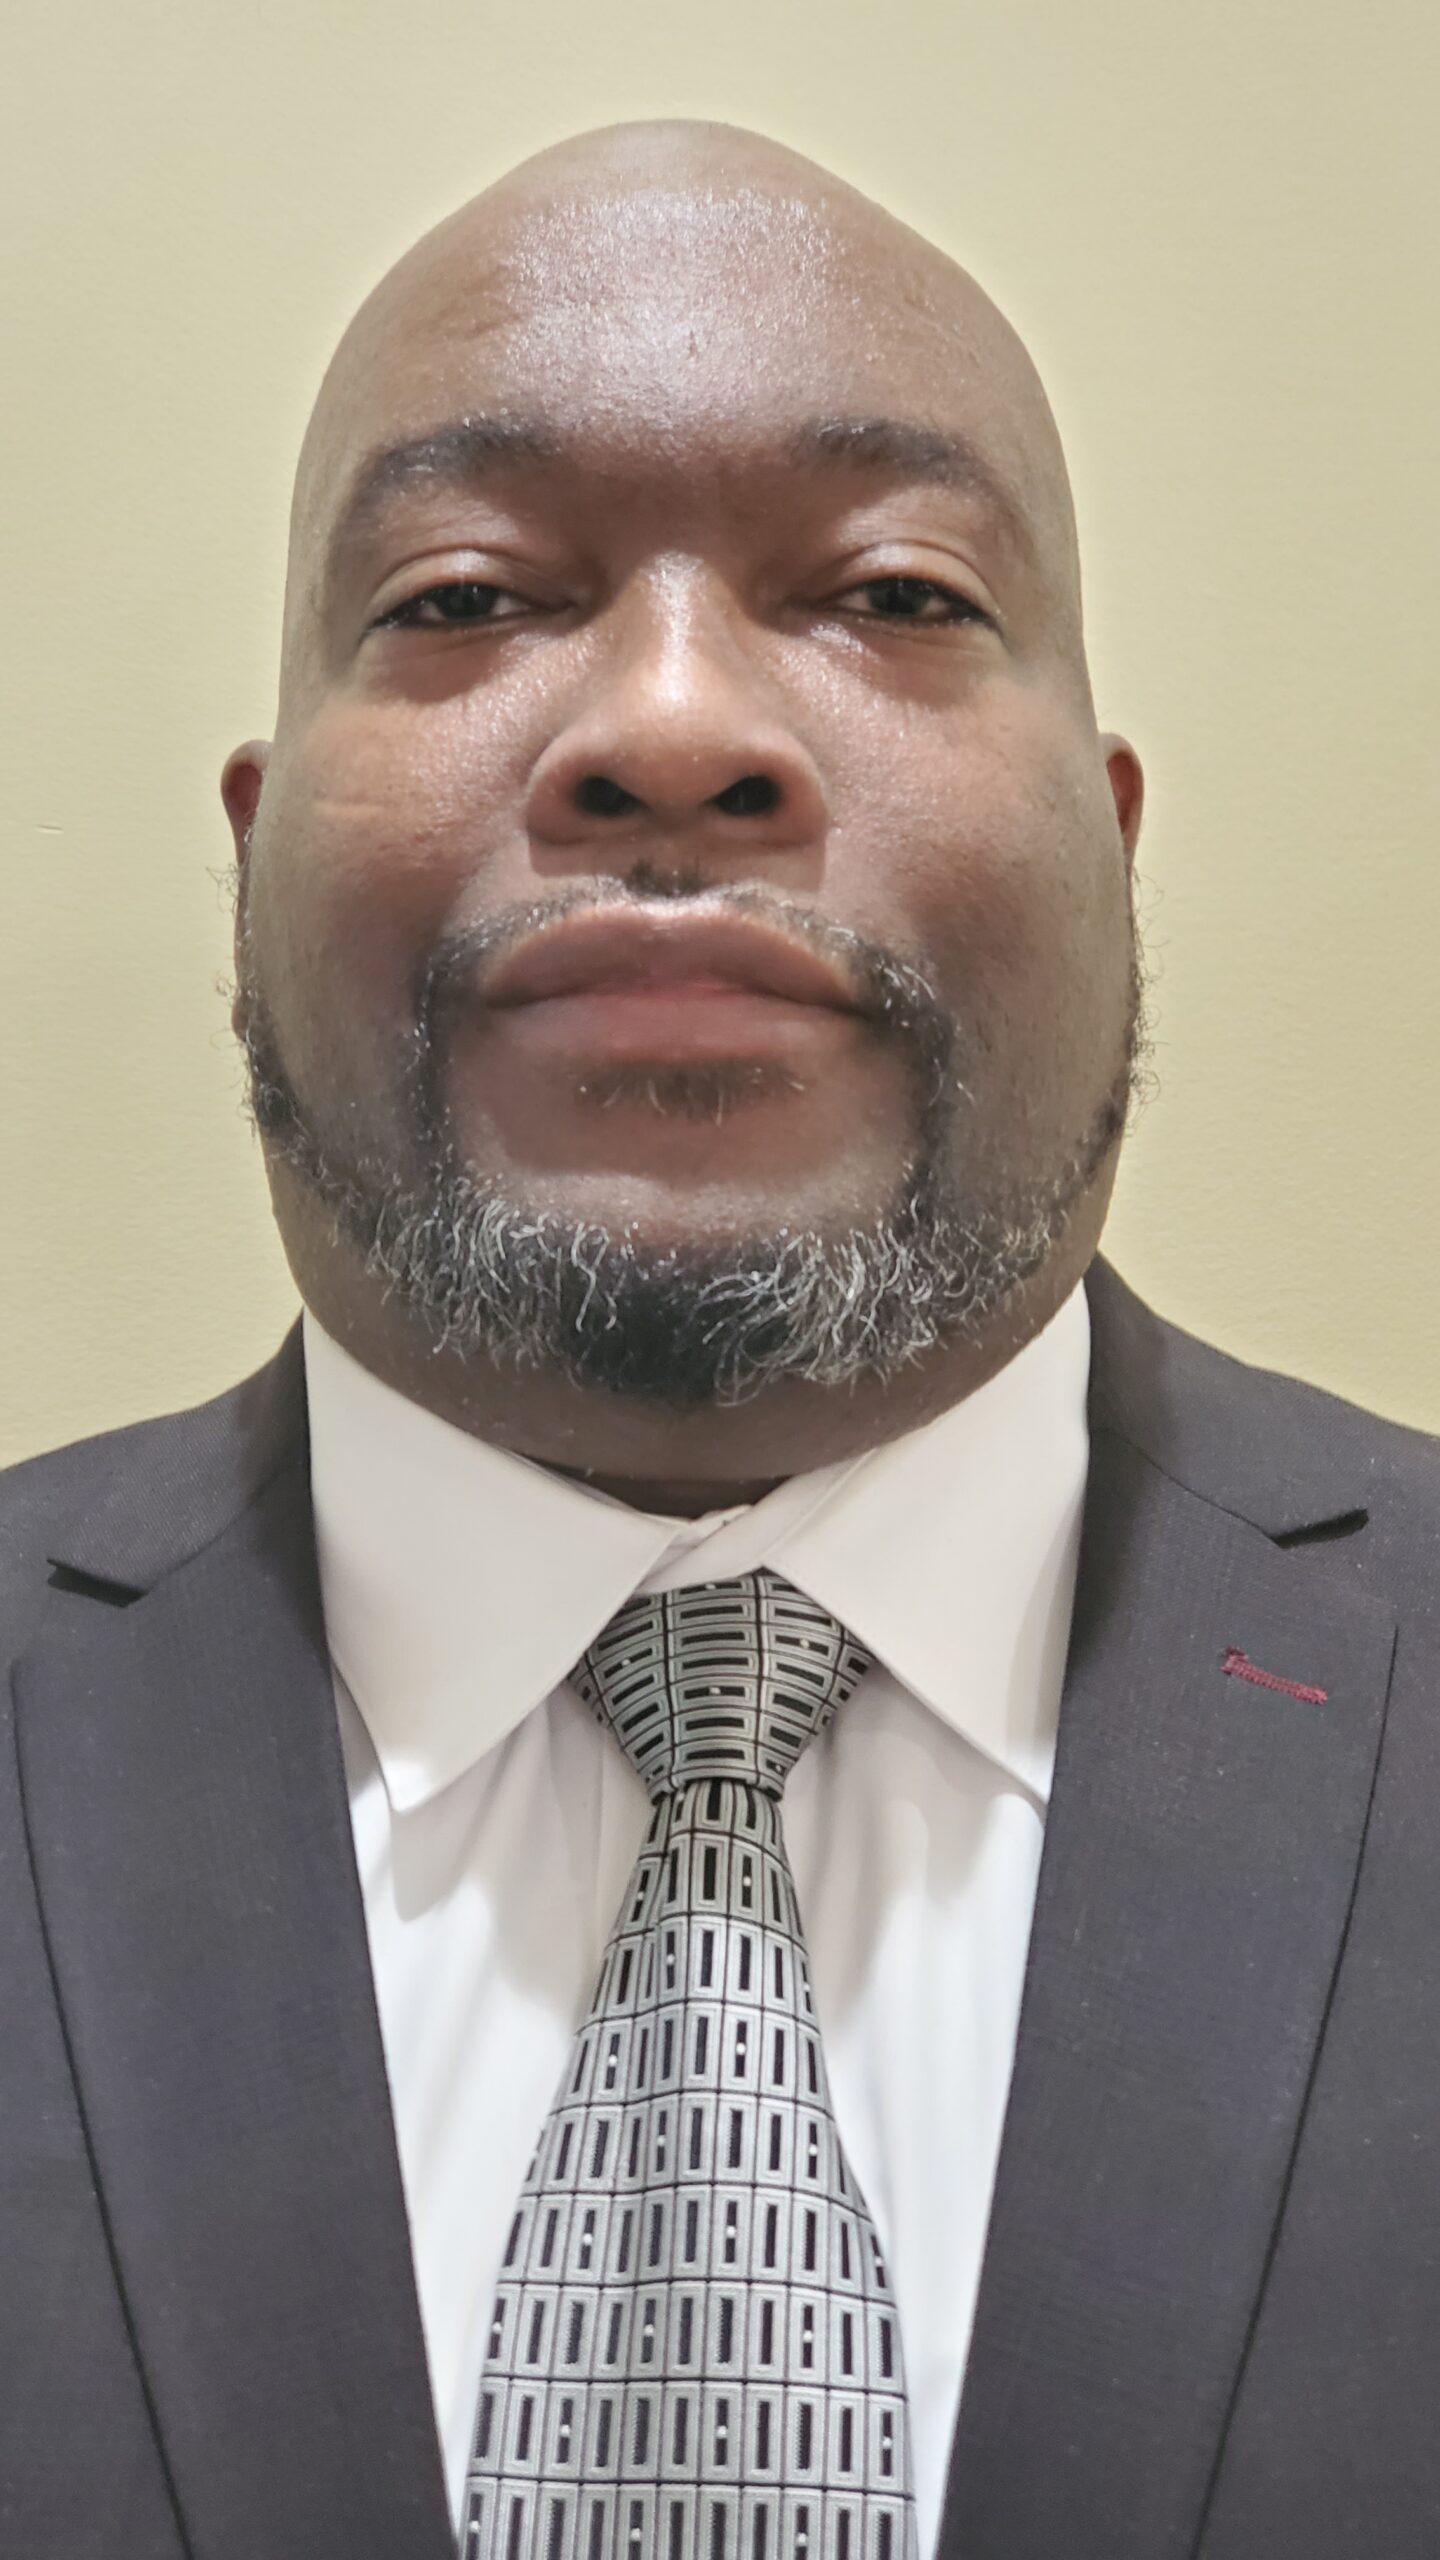 Bro. Andre Mitchell